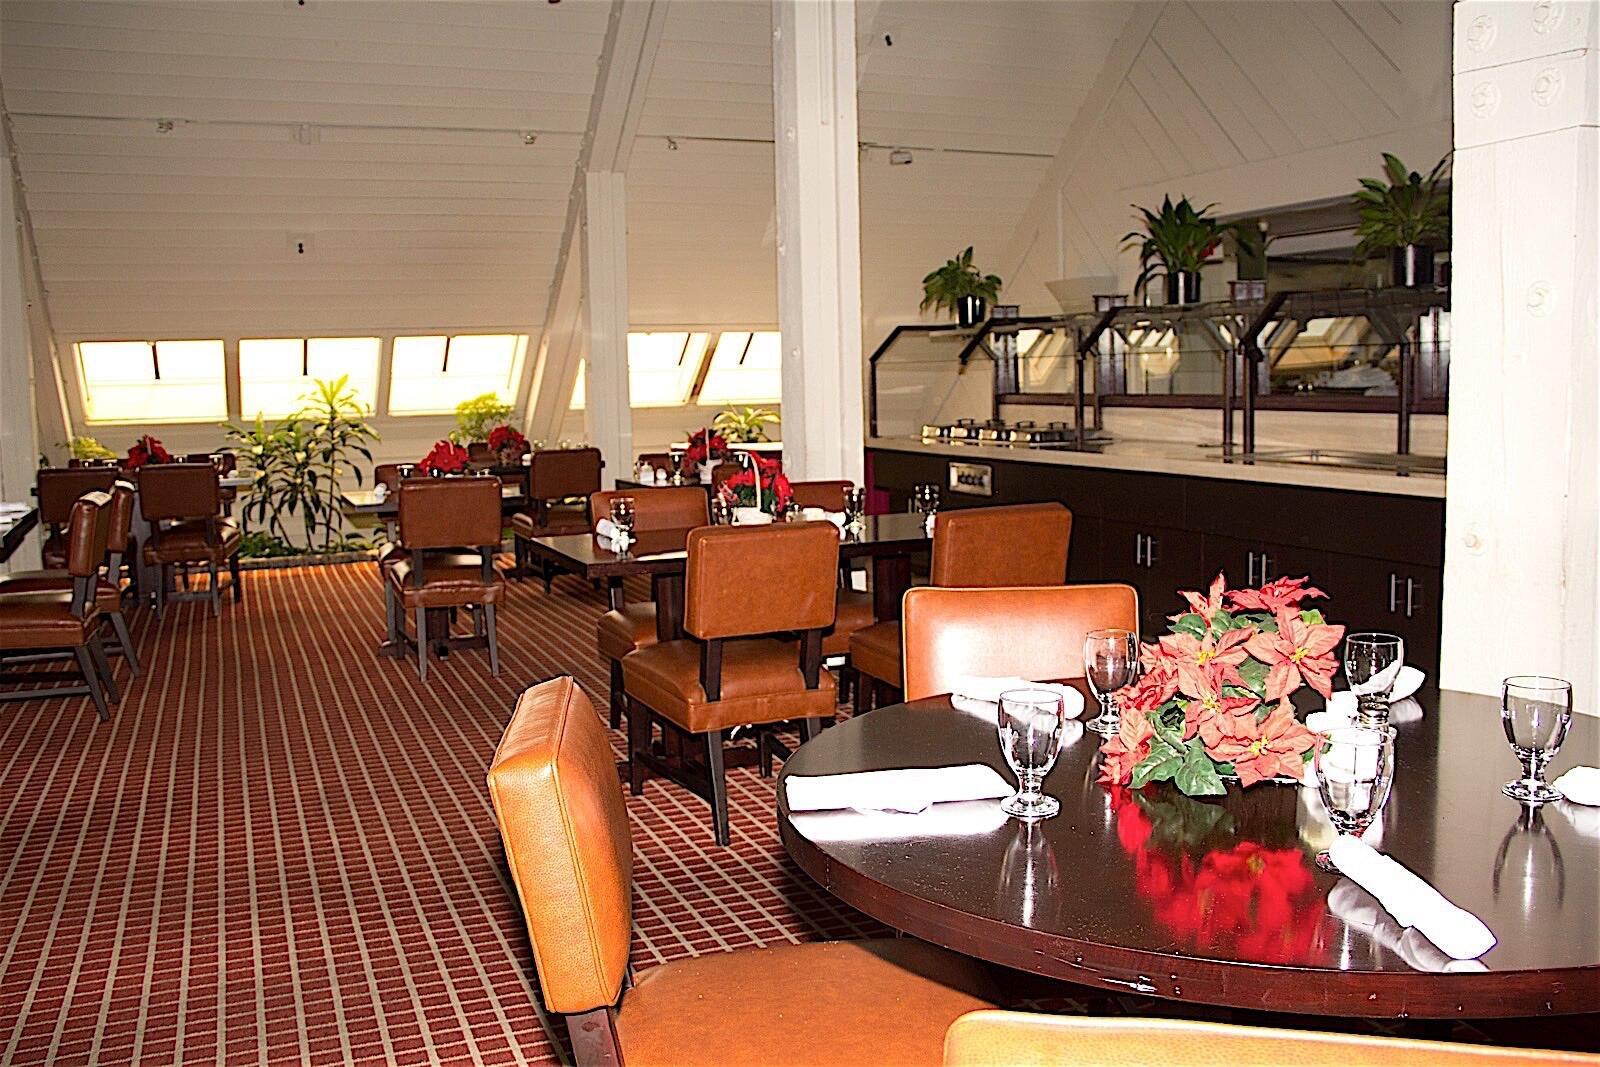 Breakfast Buffet at Hotel Fresno